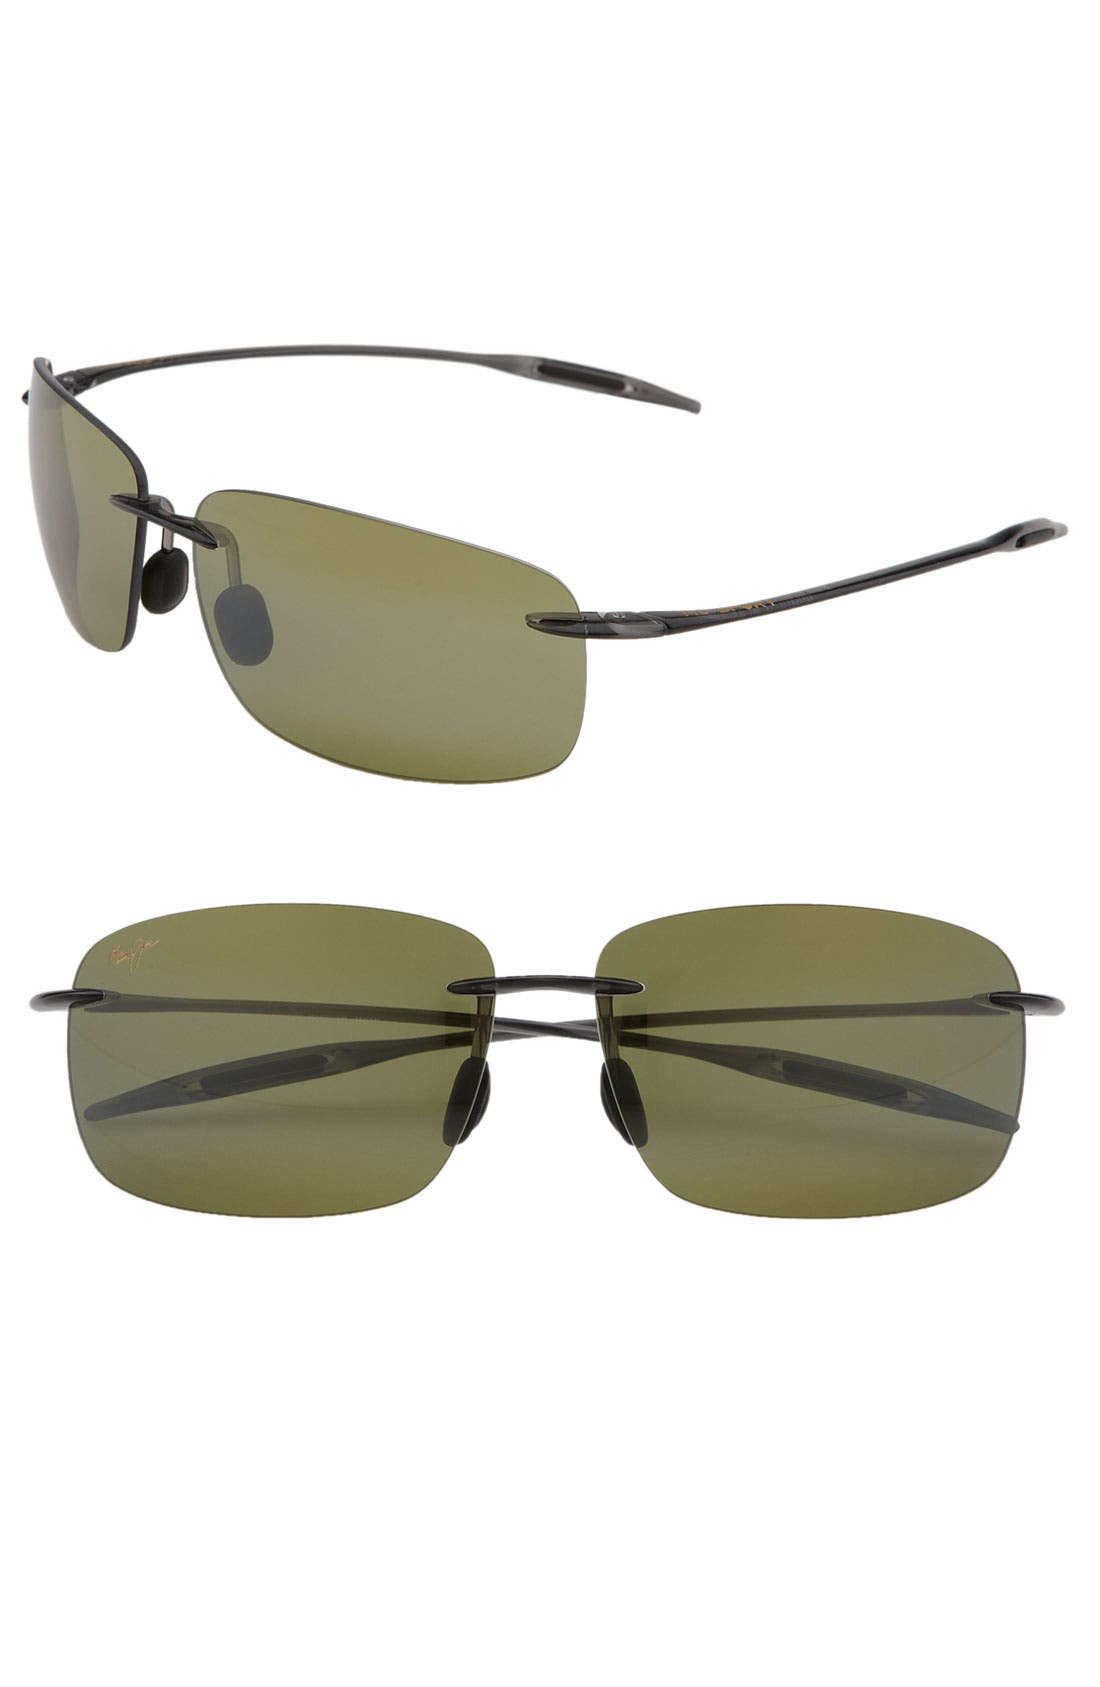 Main Image - Maui Jim Breakwall 63mm PolarizedPlus2® Rimless Sunglasses